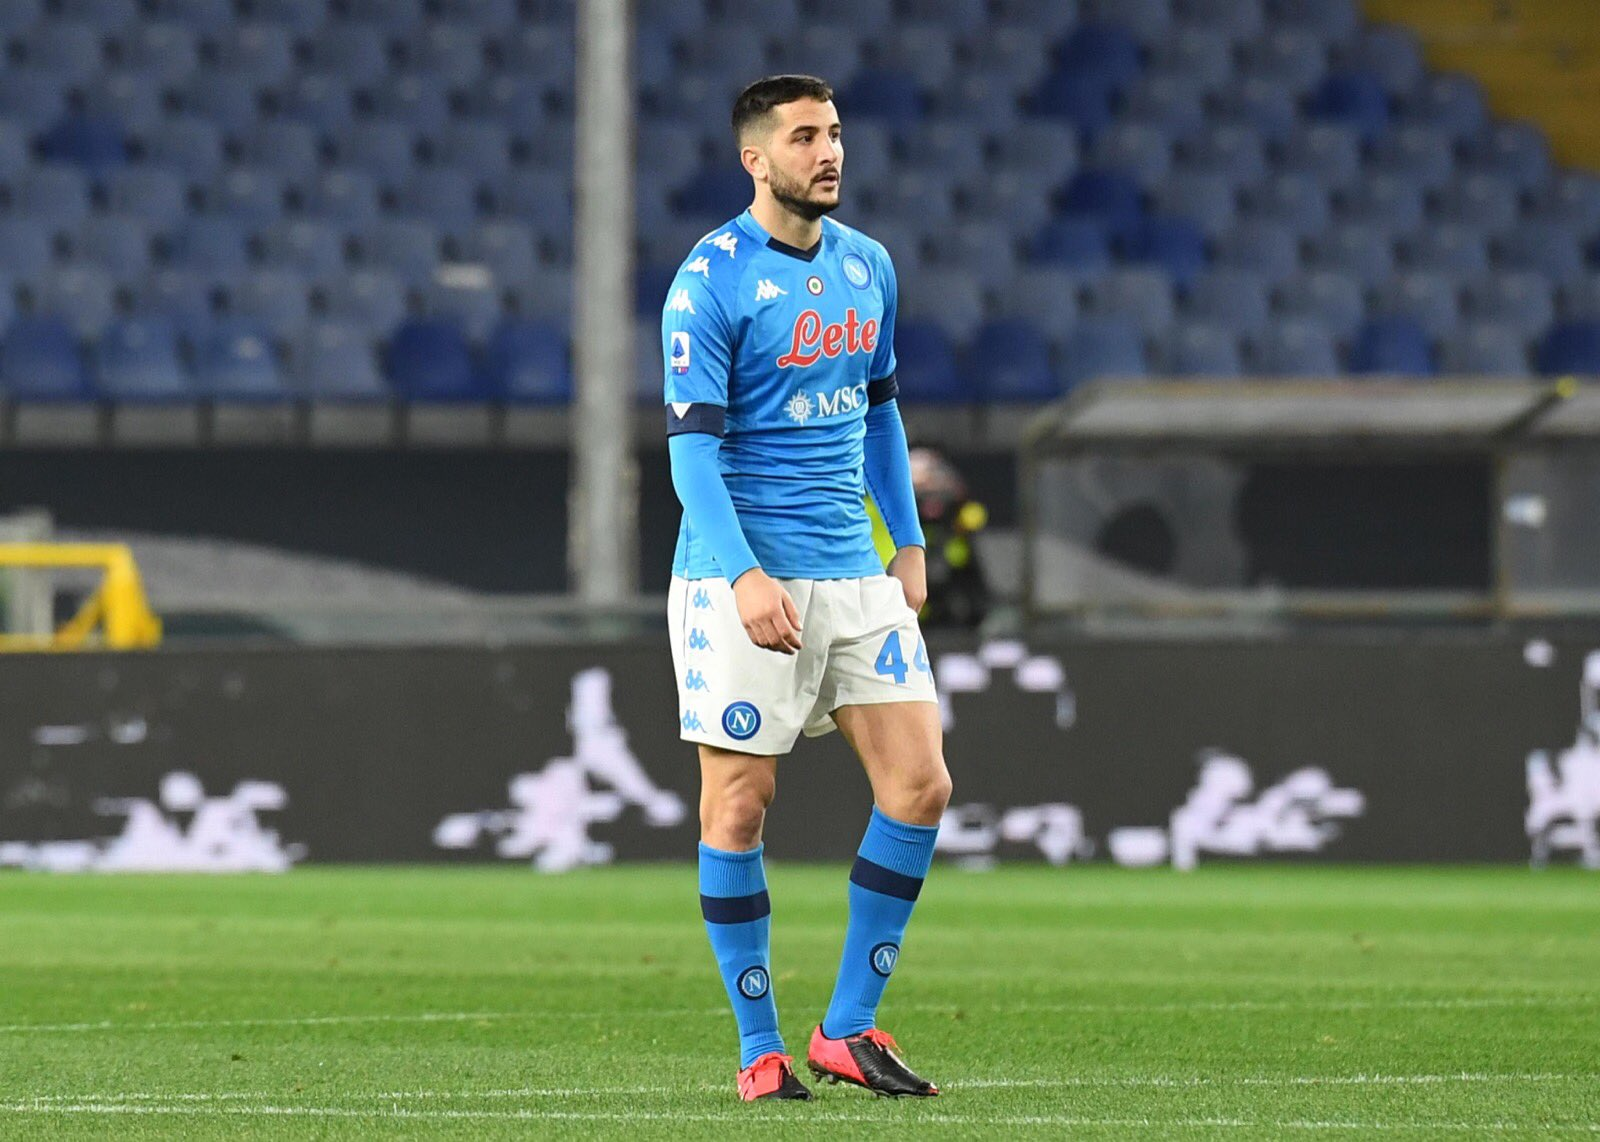 Calciomercato Napoli: l'Olympiakos tenta il colpo Manolas | StadioSport.it